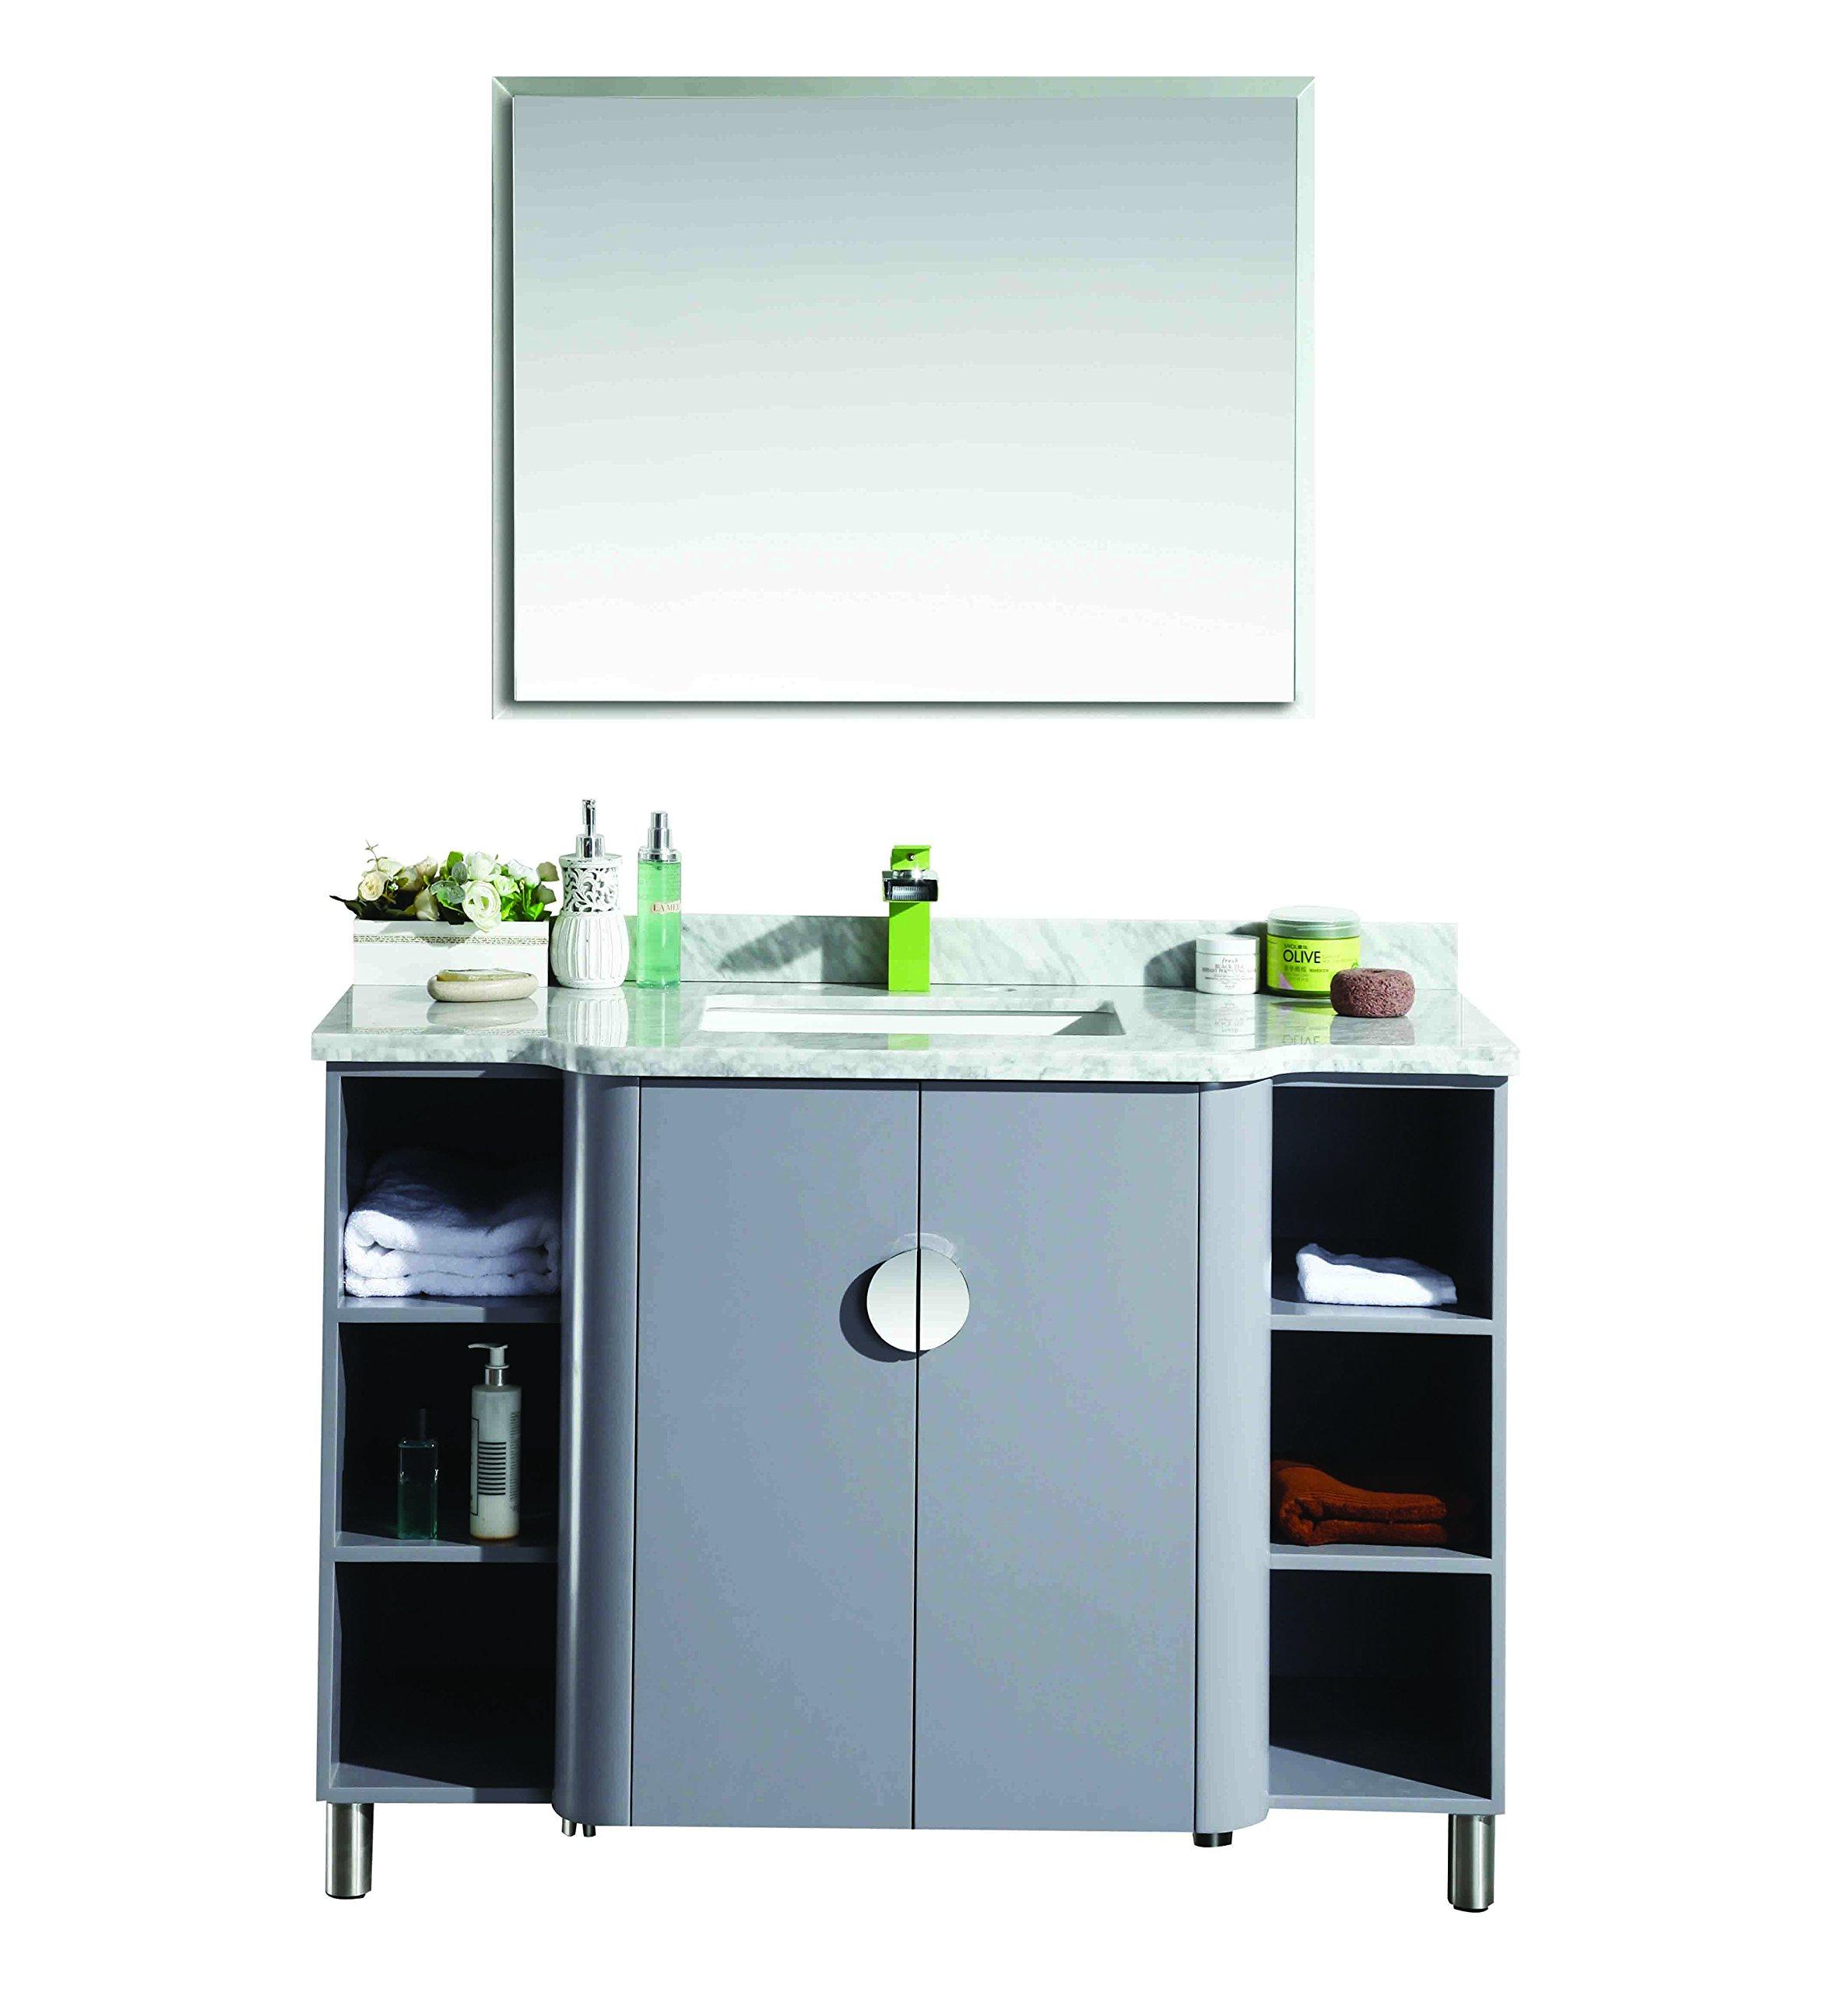 Eviva EVVN800-48GR Plus Vienna 48'' Satin Luxuries Modern Bathroom Vanity With Carrera Marble Top & Porcelain Sink, Grey by Eviva (Image #1)